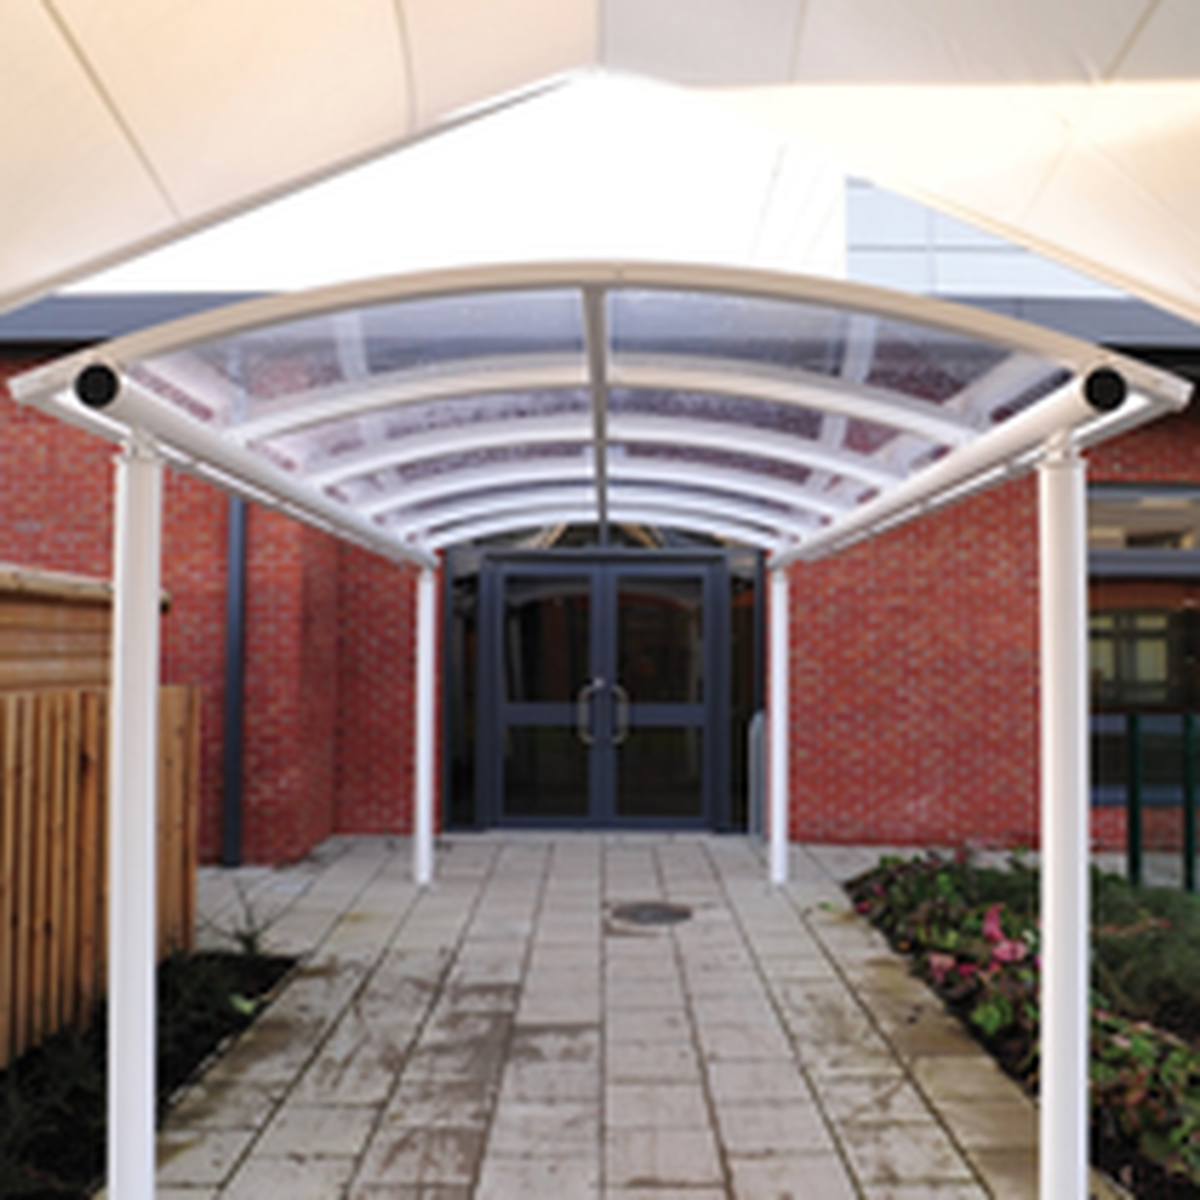 Luton Entrance Canopy